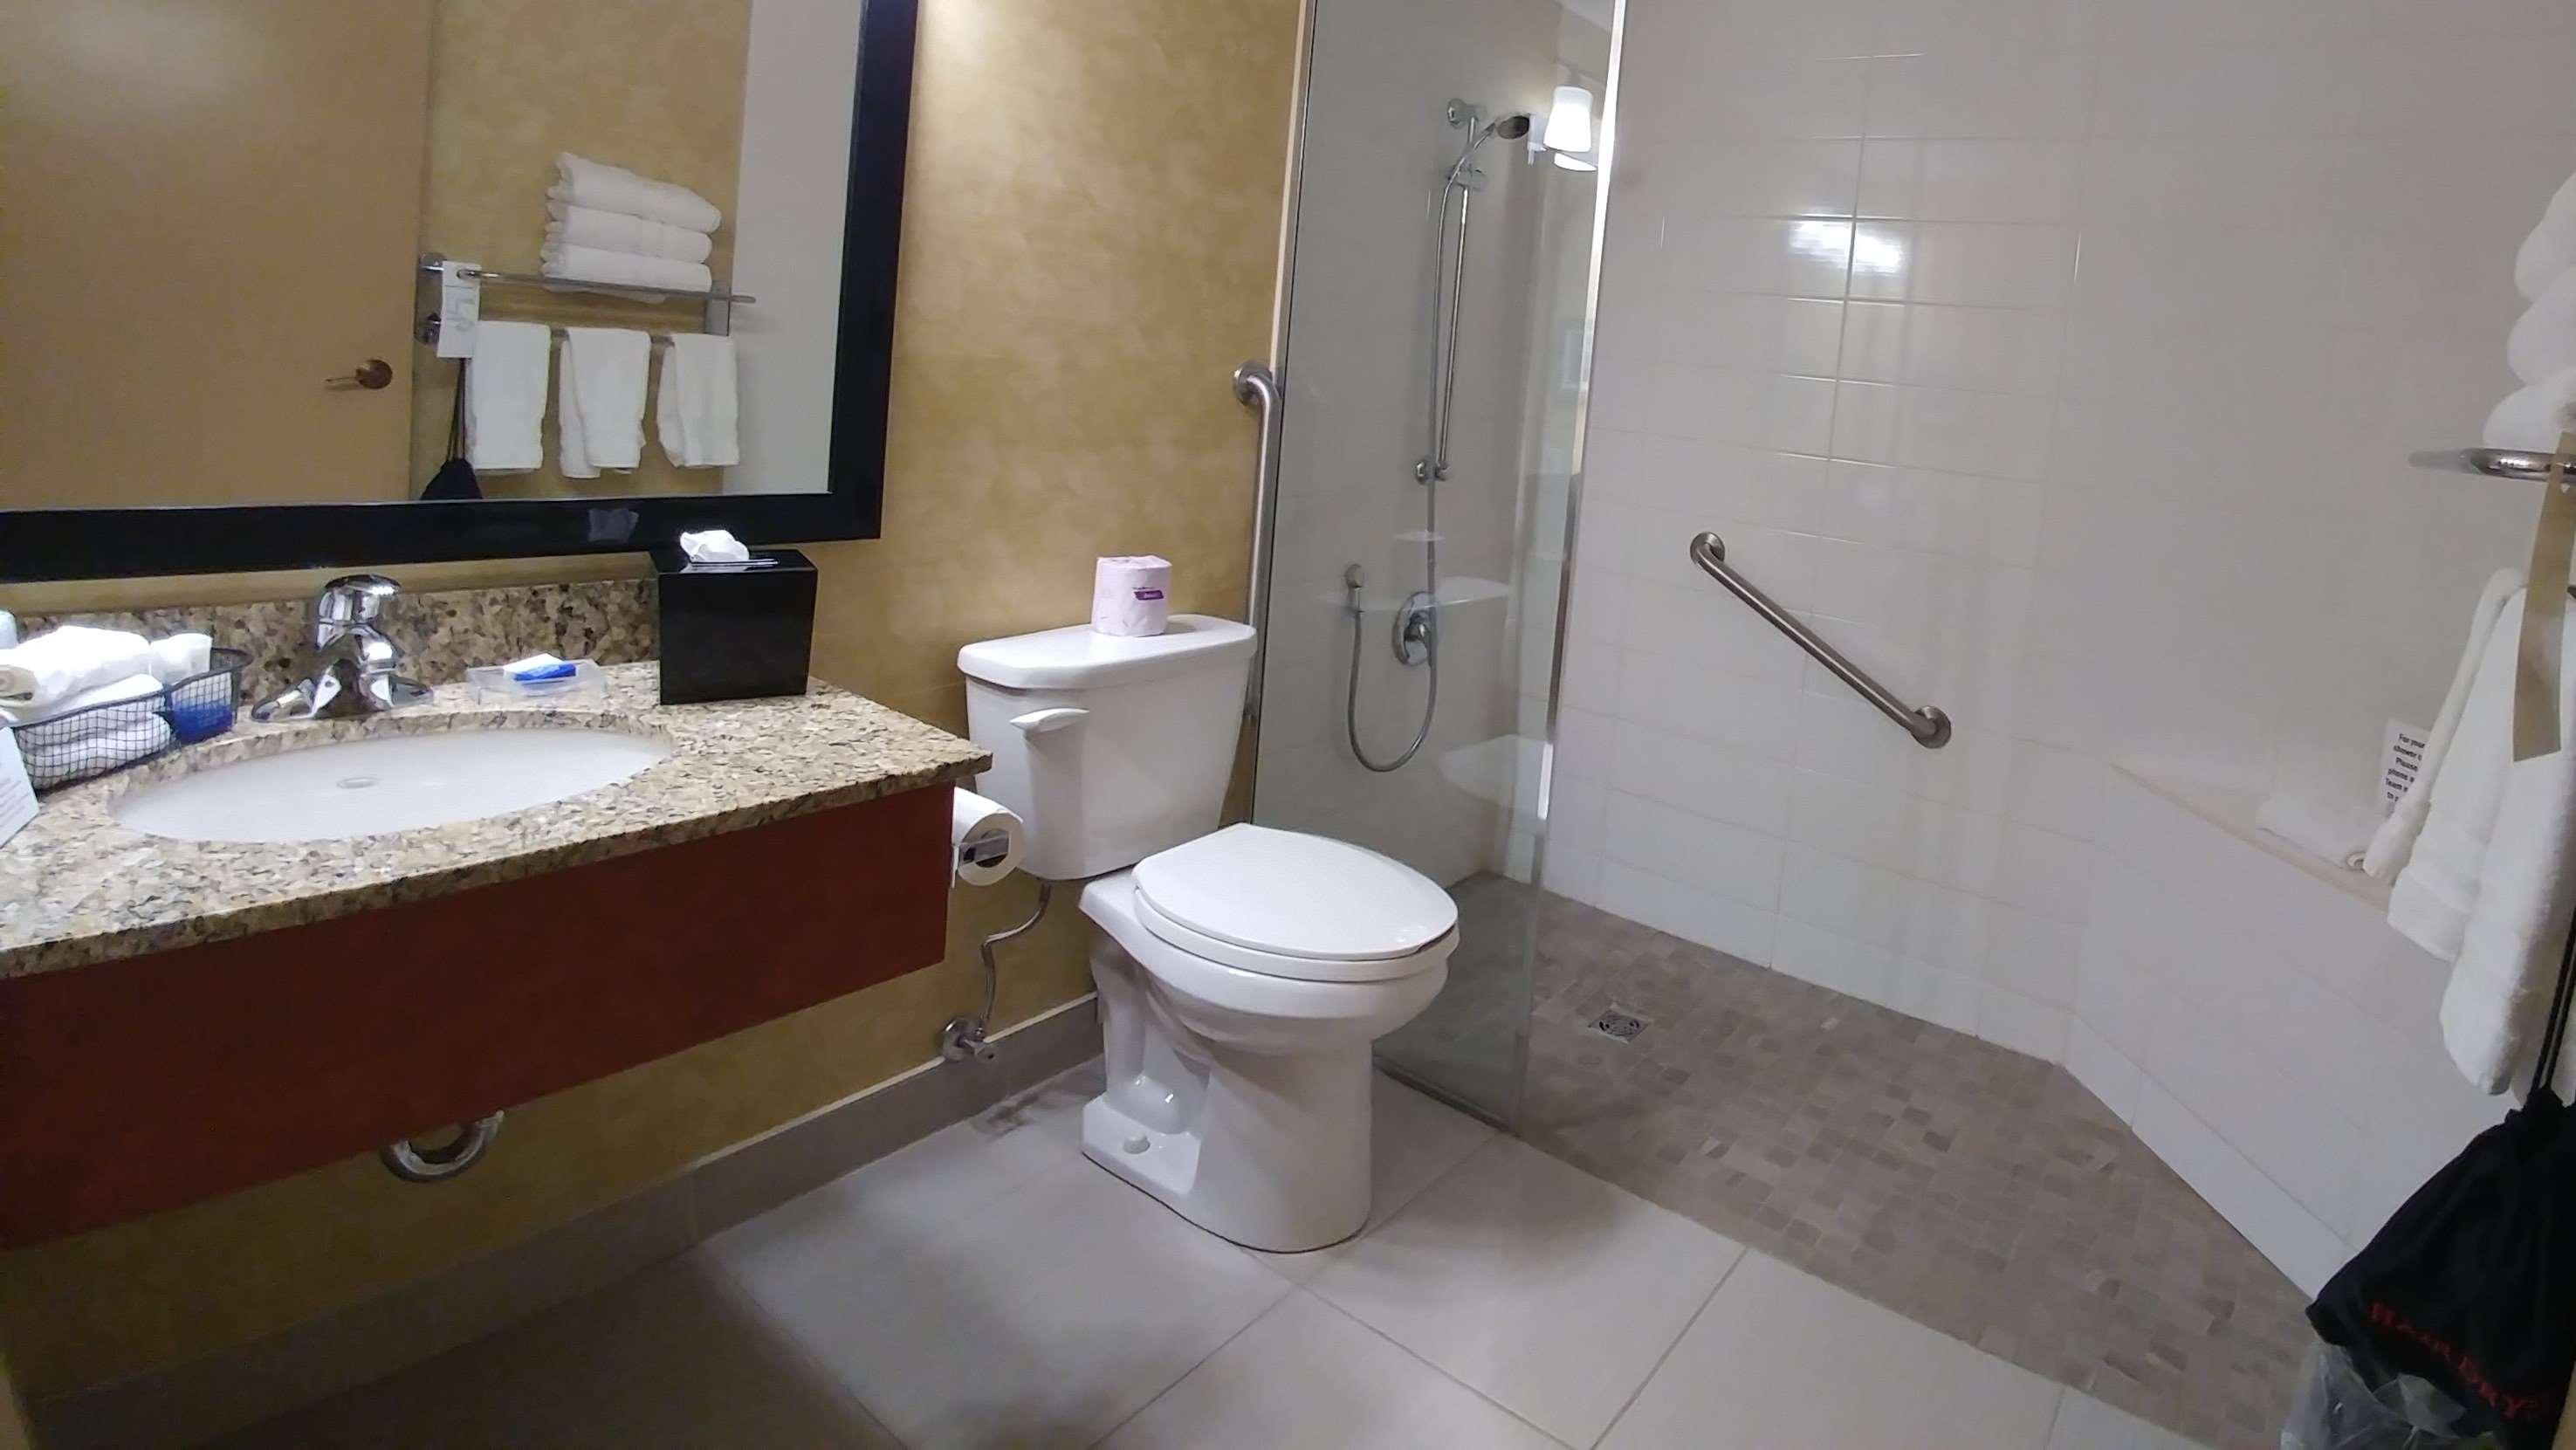 Best Western Plus Rose City Suites in Welland: Accessible bathroom suite 101